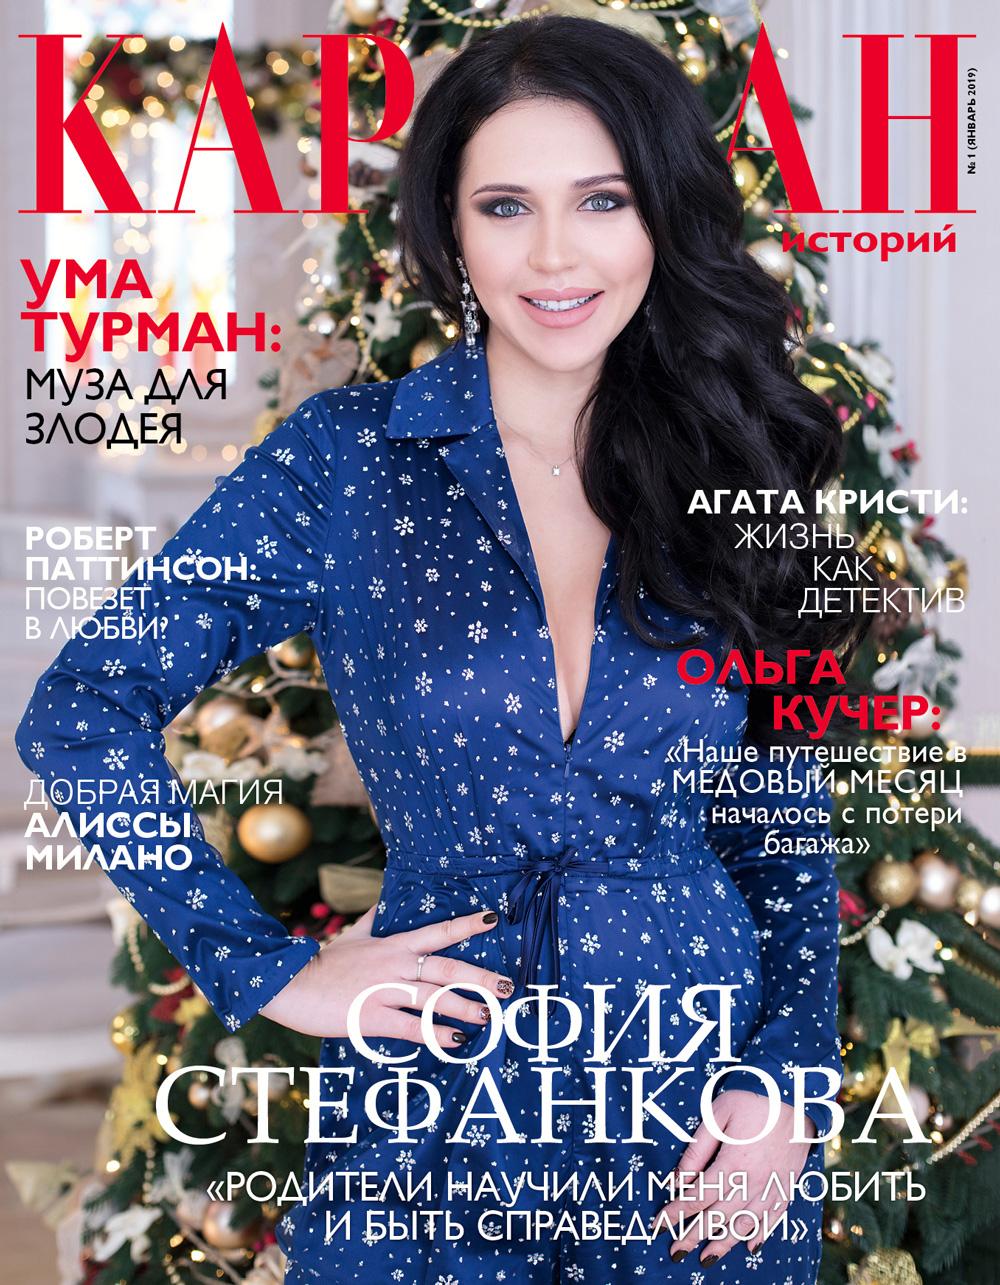 София Стефанкова Караван историй №1 2019